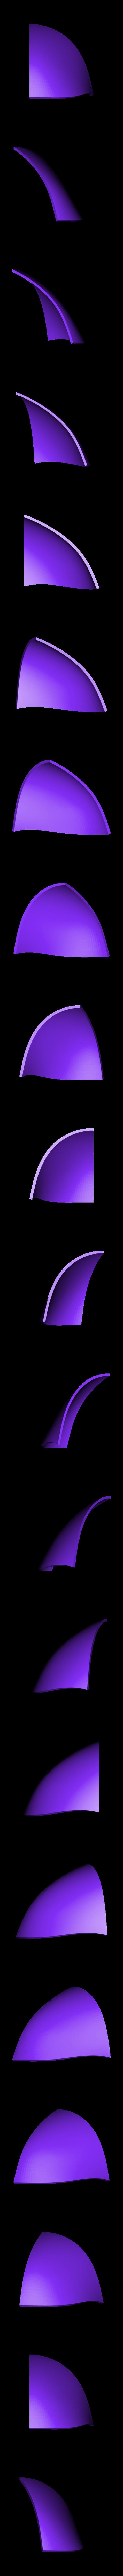 Part_16_v2_5.stl Download free STL file  Iron Musketeer's Helmet (Final Fantasy XI) • 3D printable design, VillainousPropShop